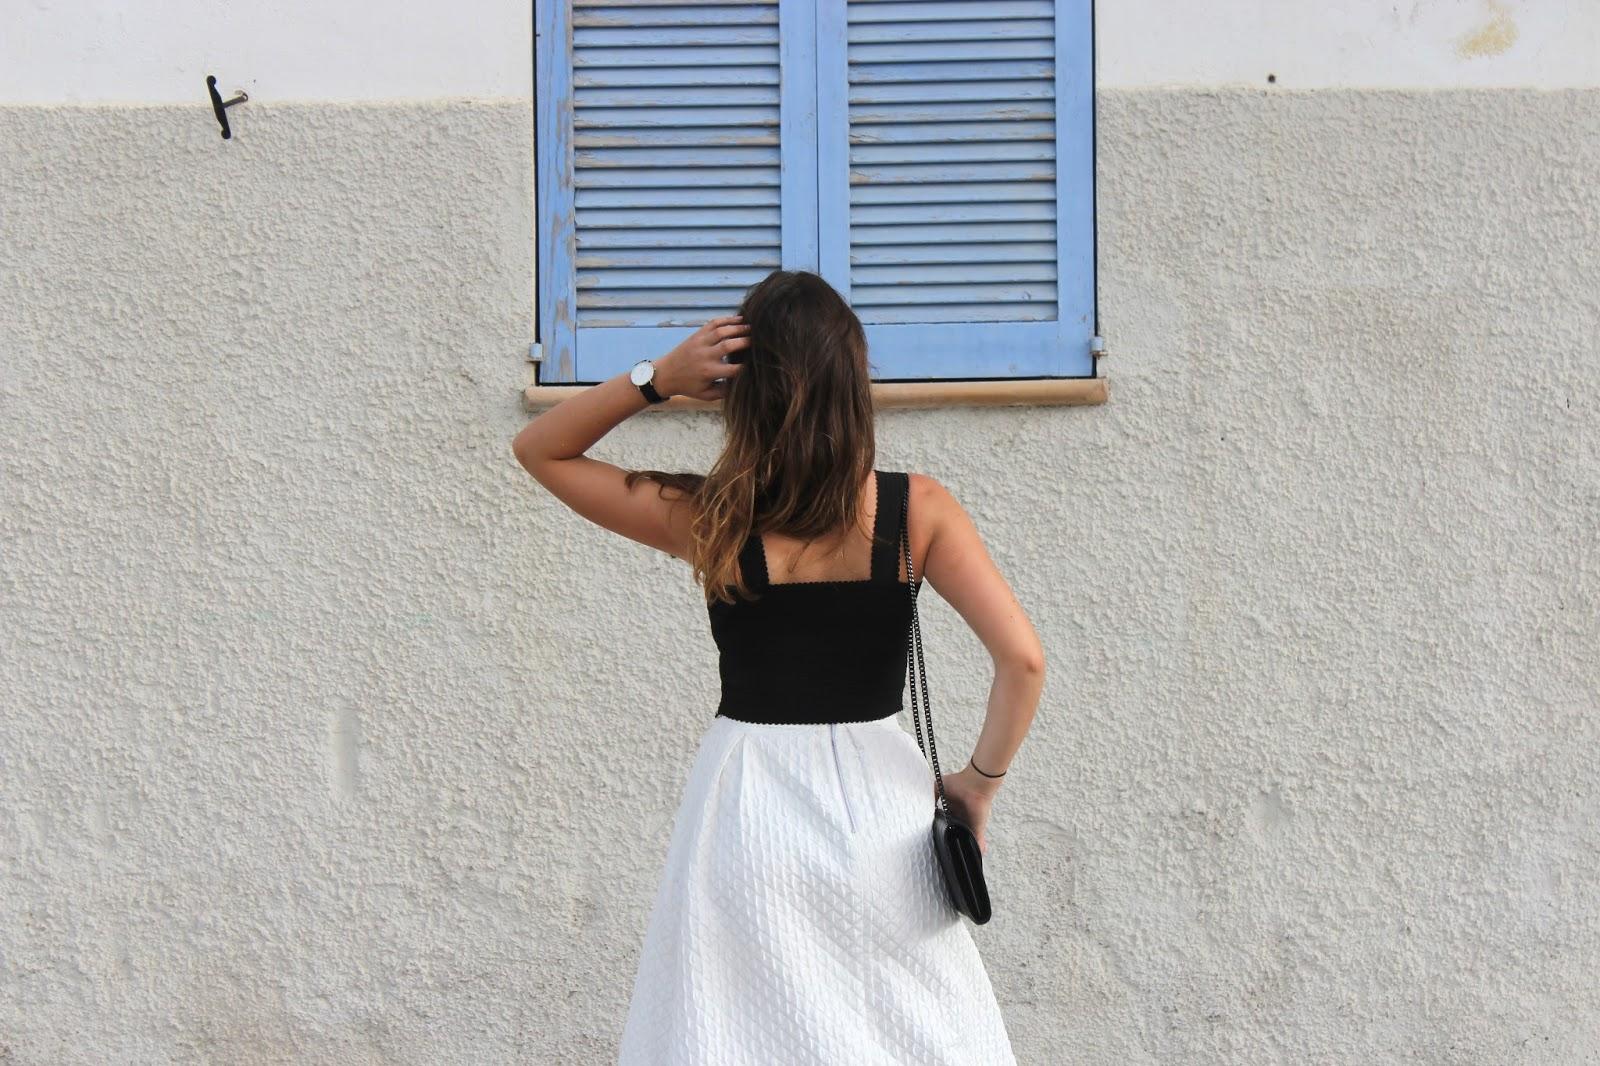 bd8c3a6b953b Arifashionthread - Luxembourg Fashion and Lifestyle Blog  Ibiza - go ...